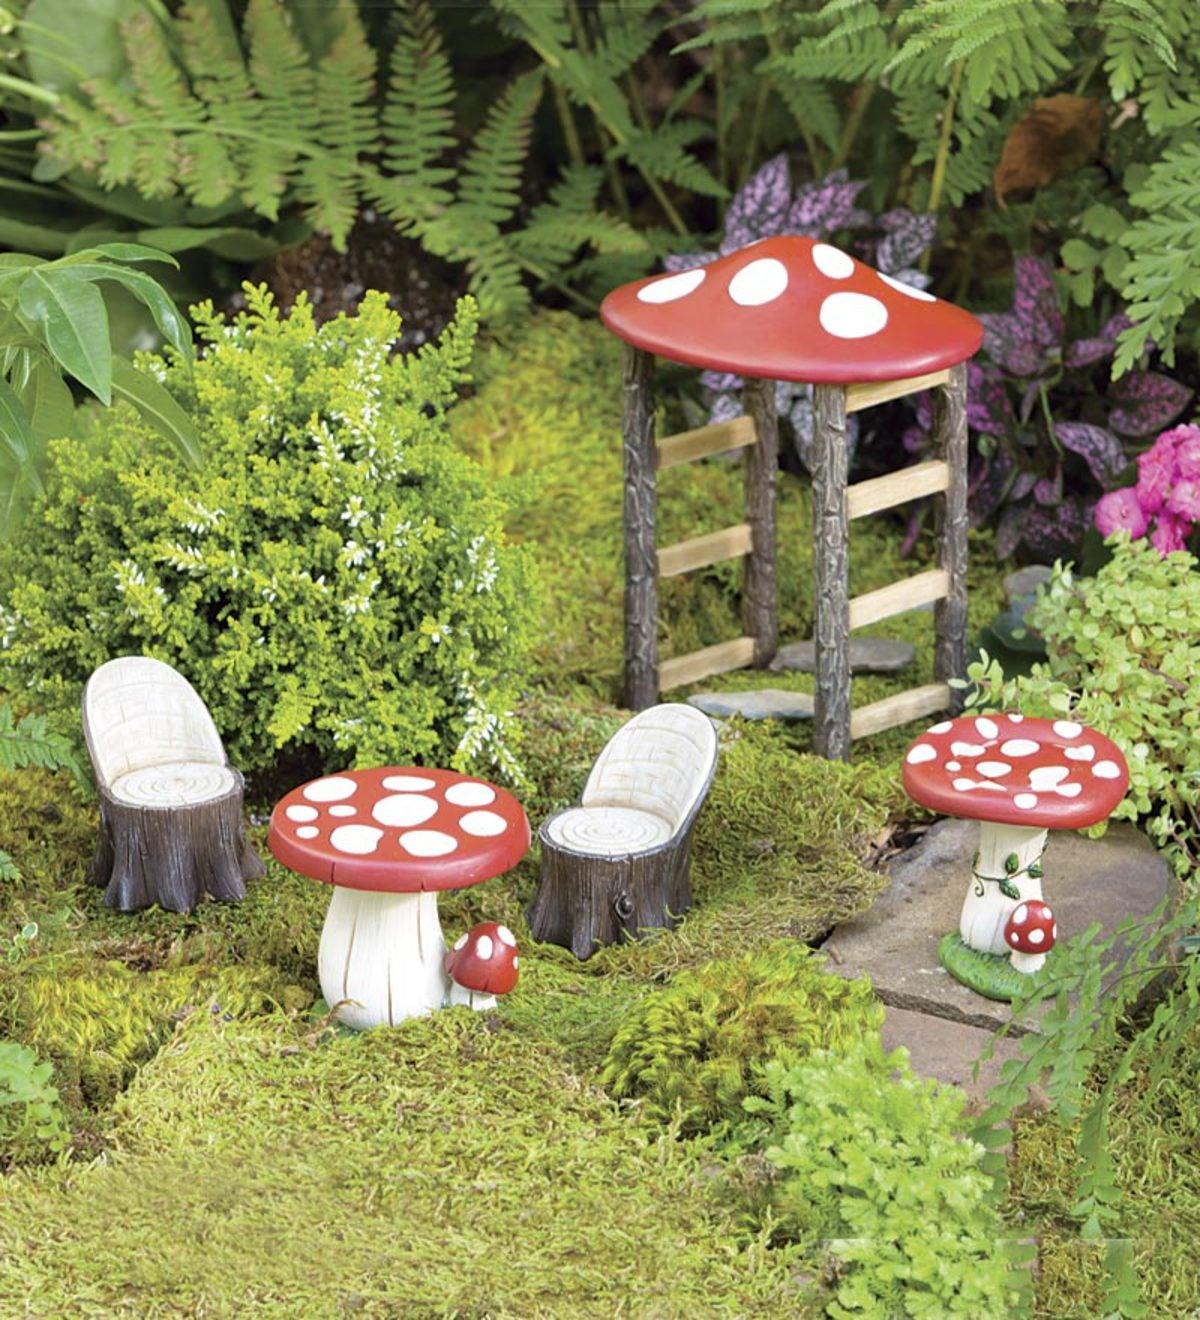 Edible Landscaping And Fairy Gardens: Miniature Fairy Garden Mushroom Furniture Set